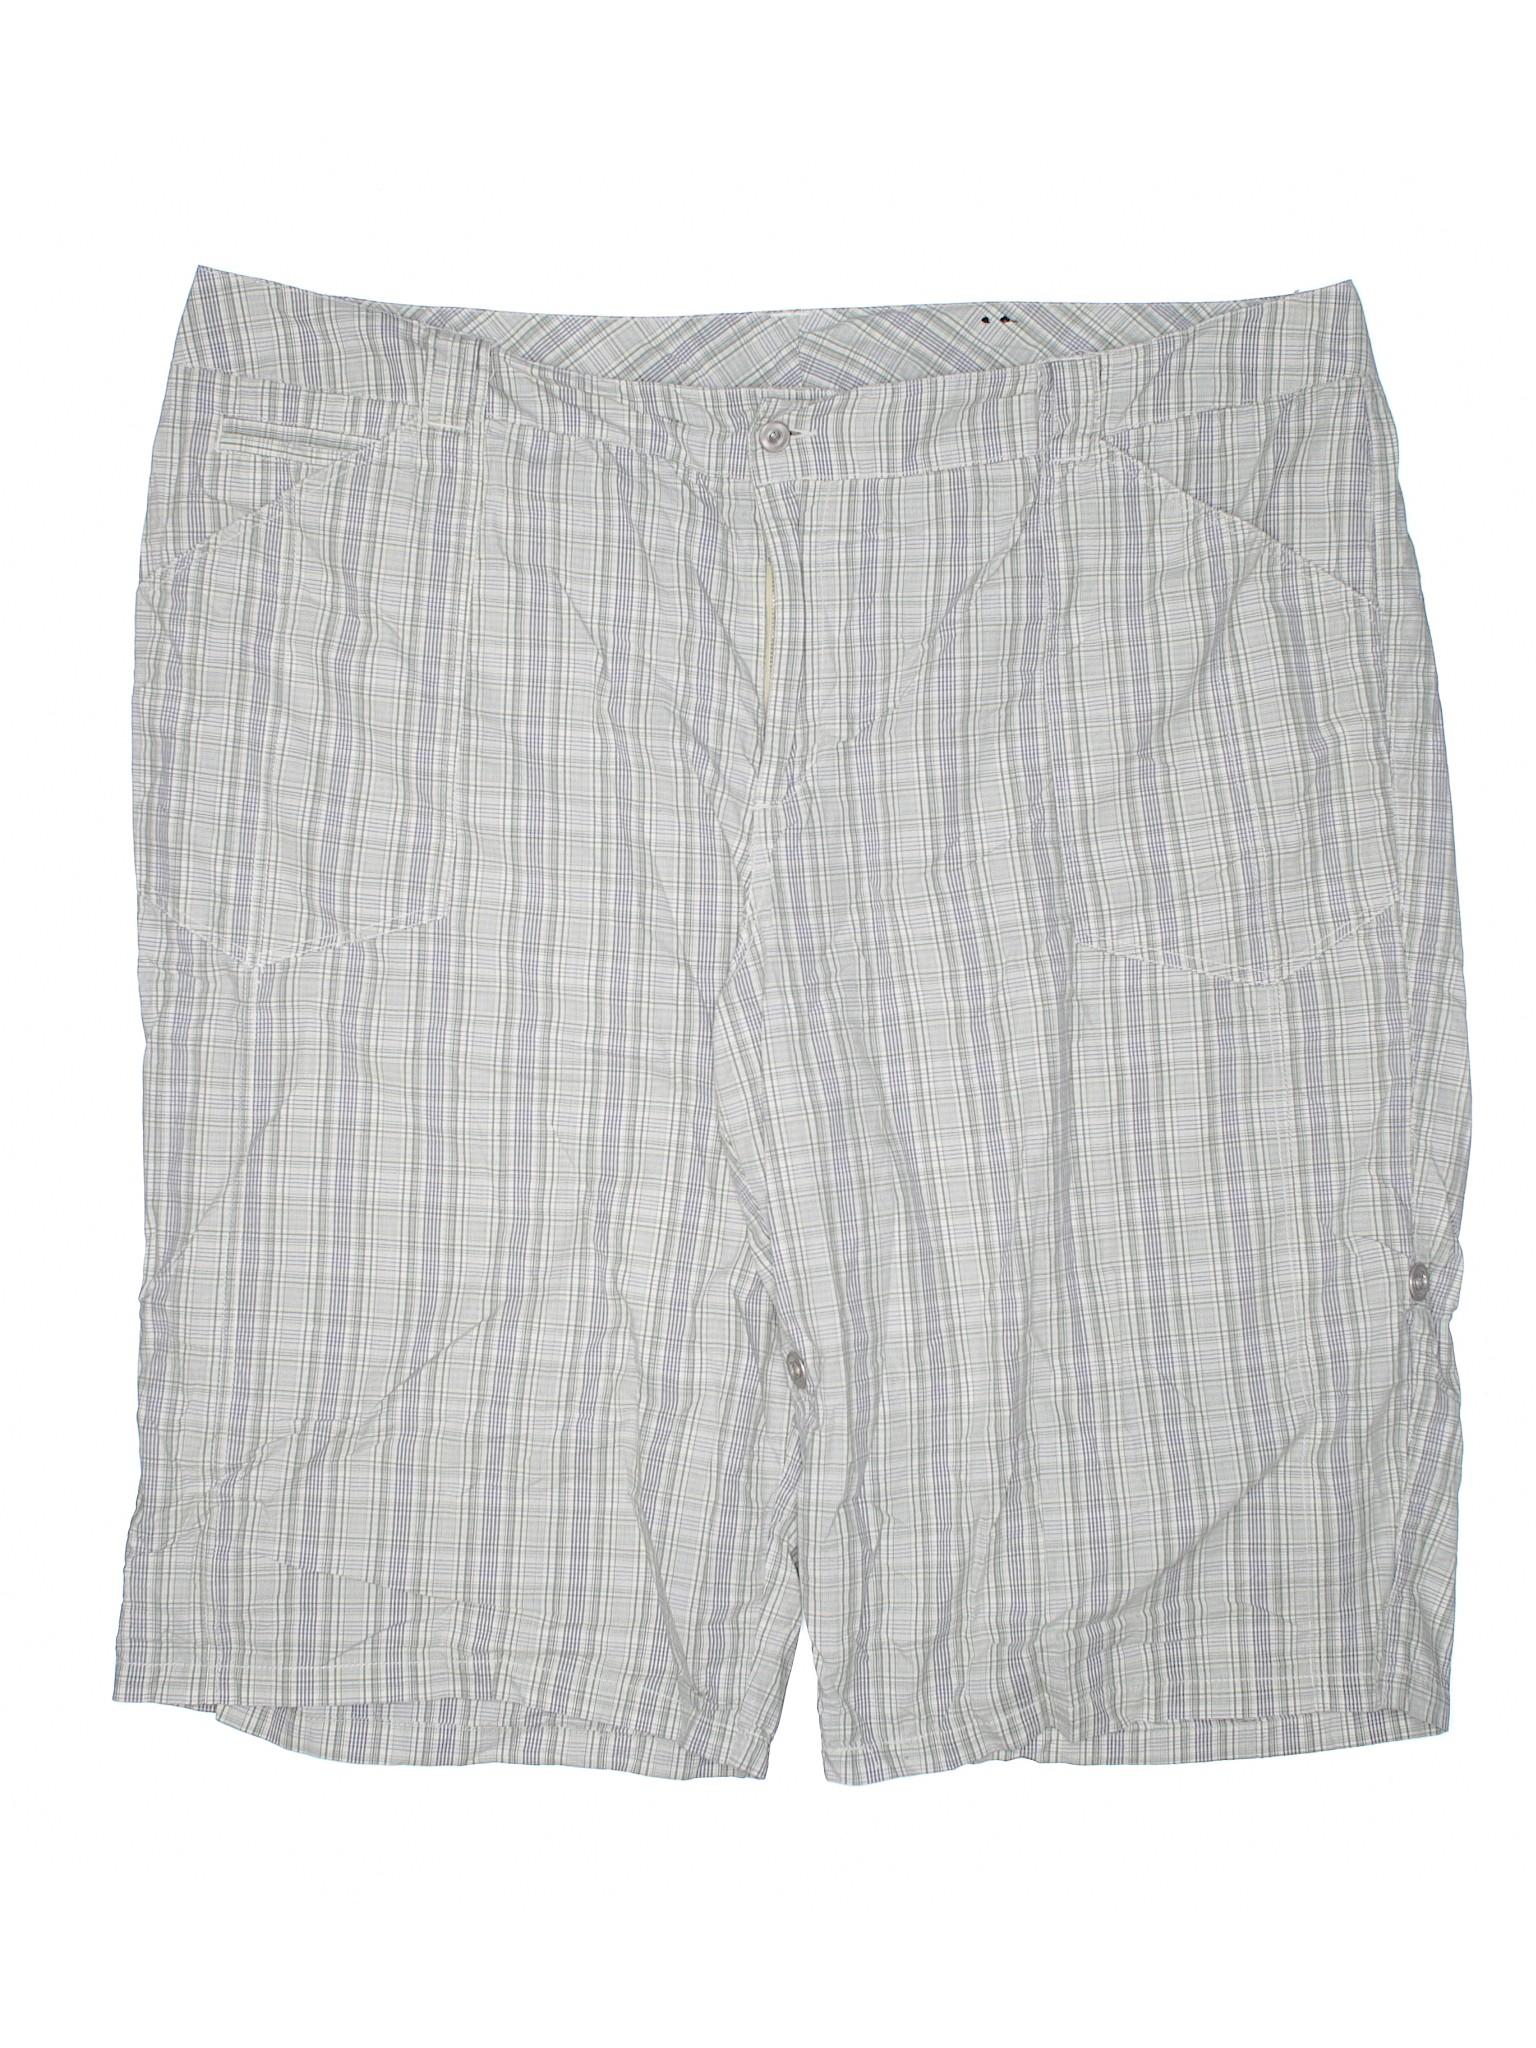 Shorts Boutique Venezia Shorts Boutique Venezia TxYwvI4q1